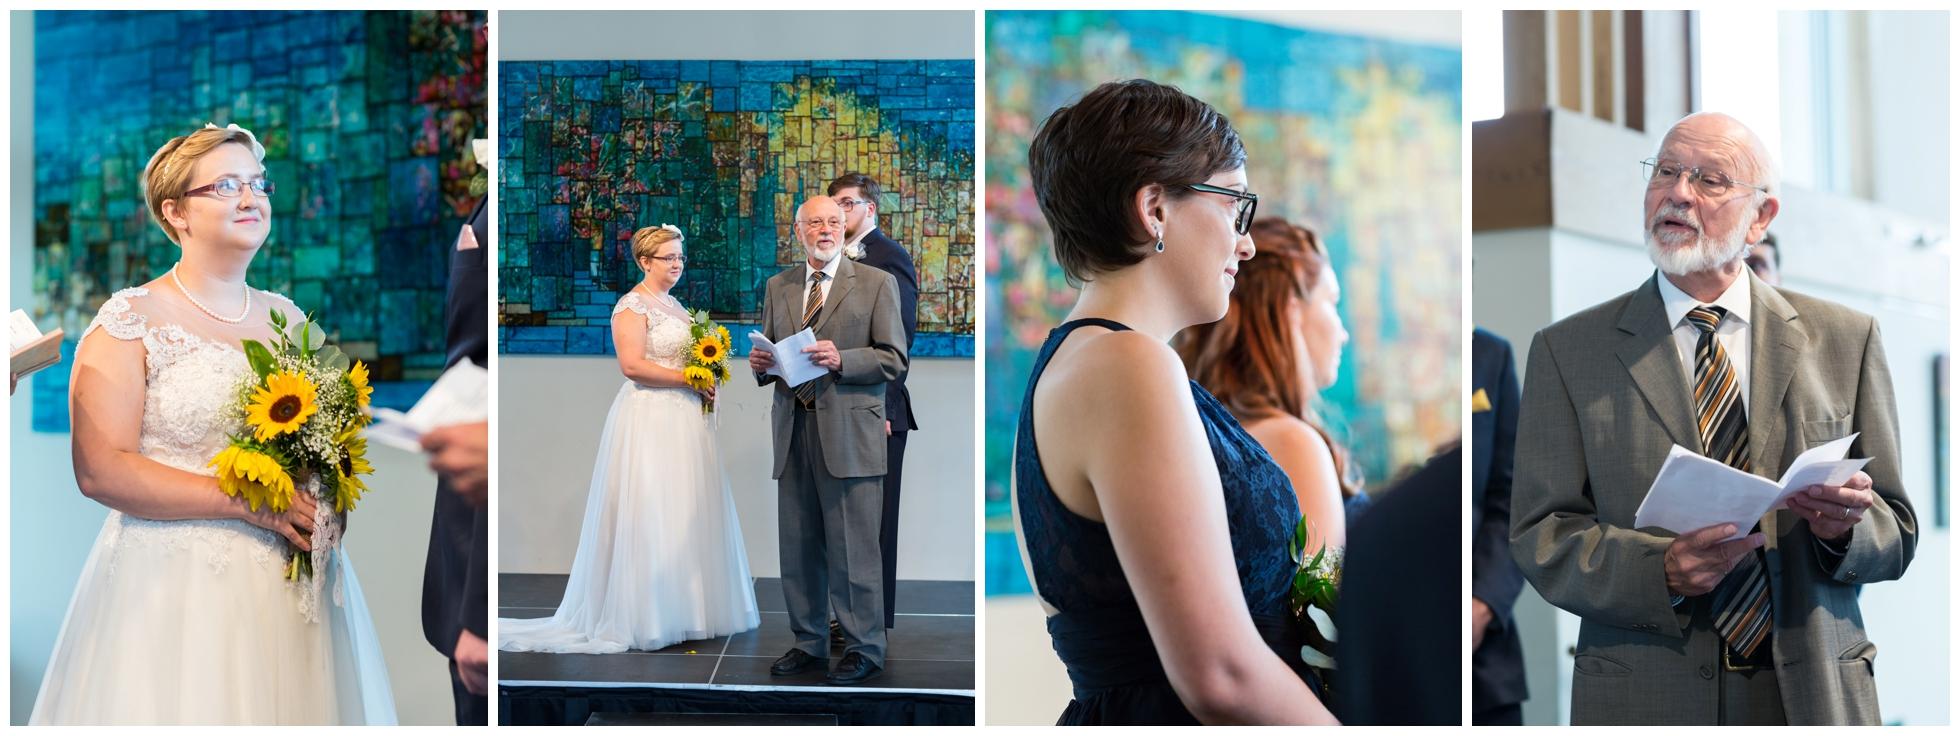 Toronto Wedding Chris Kate (Selena Phillips-Boyle)_0003.jpg